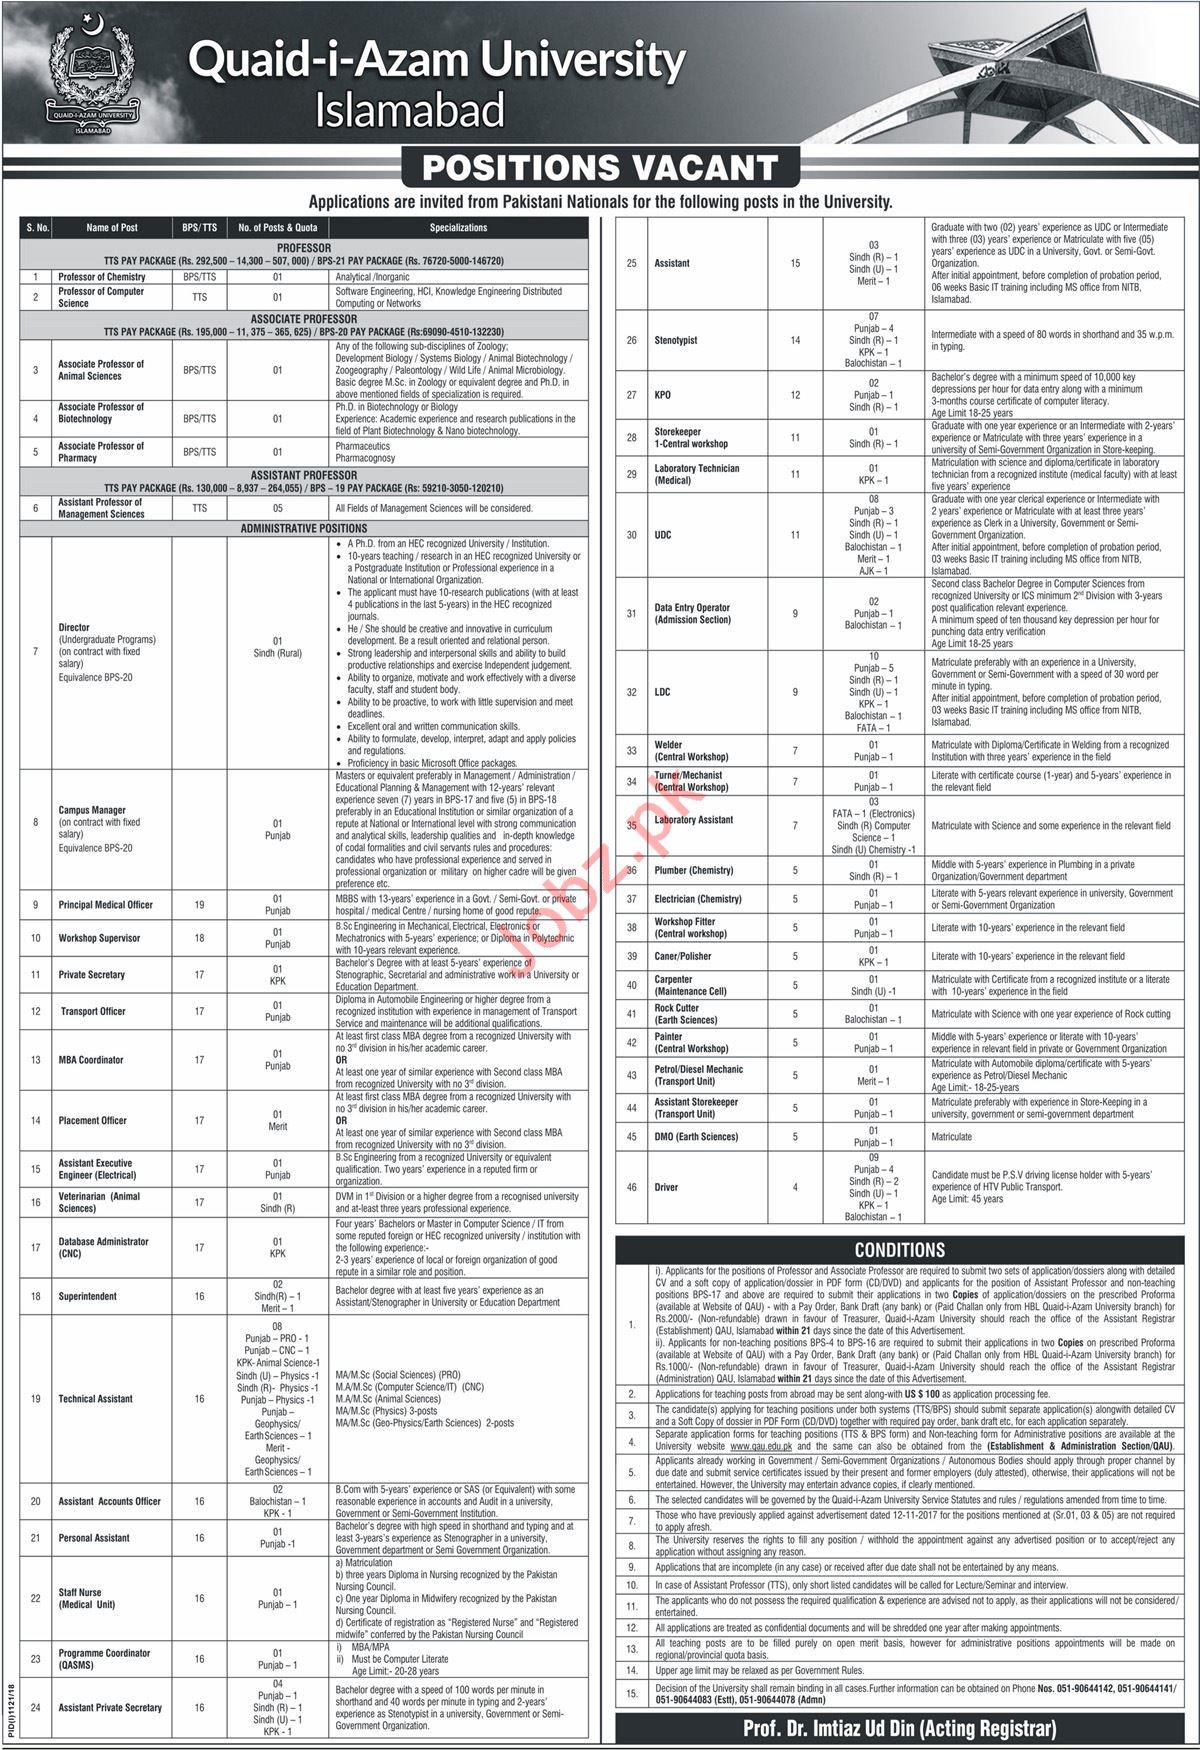 Quaid i Azam University Islamabad Professors Jobs 2018